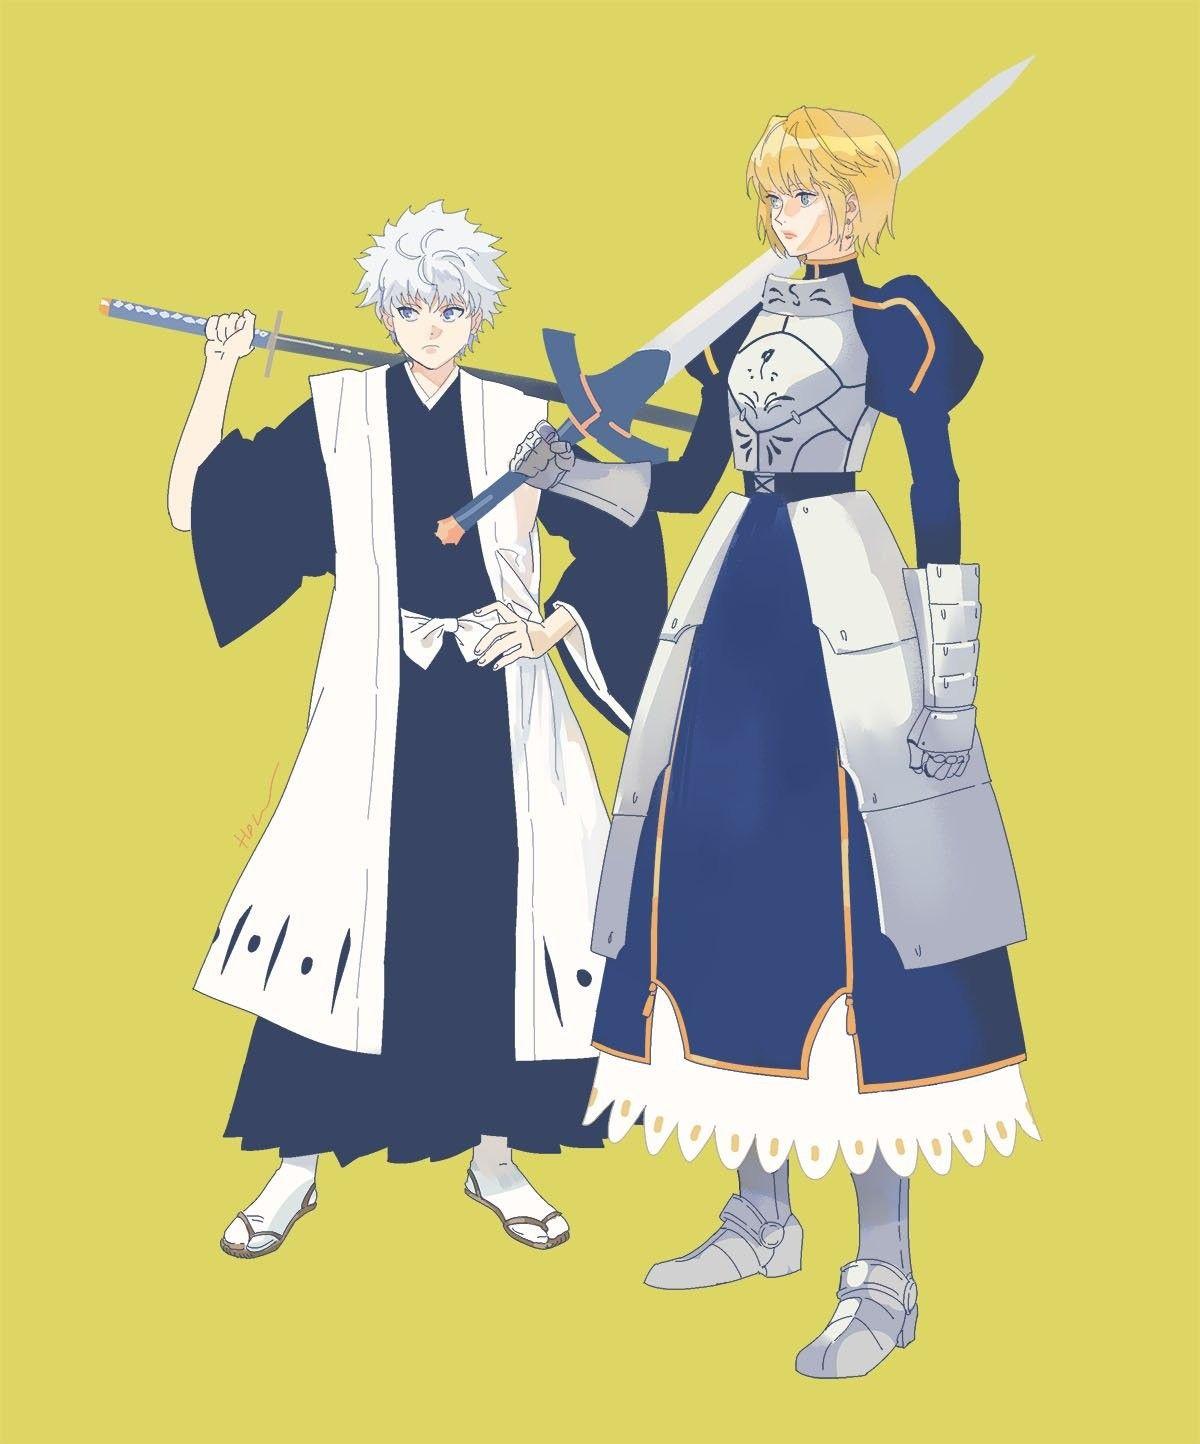 Pin by eve on Kurapika x hxh Anime, Anime life, Hunter